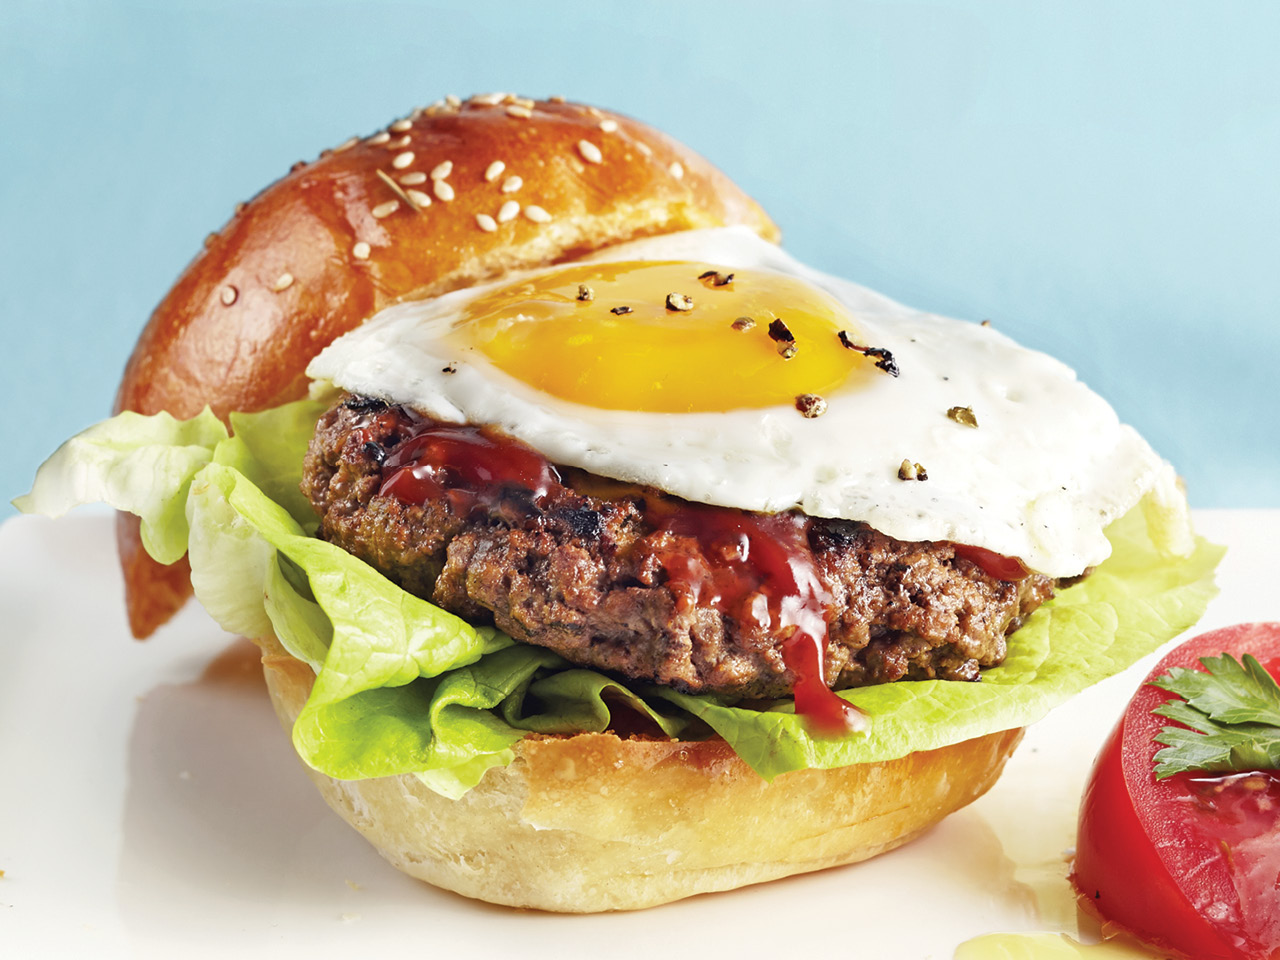 Steak and Egg Burger